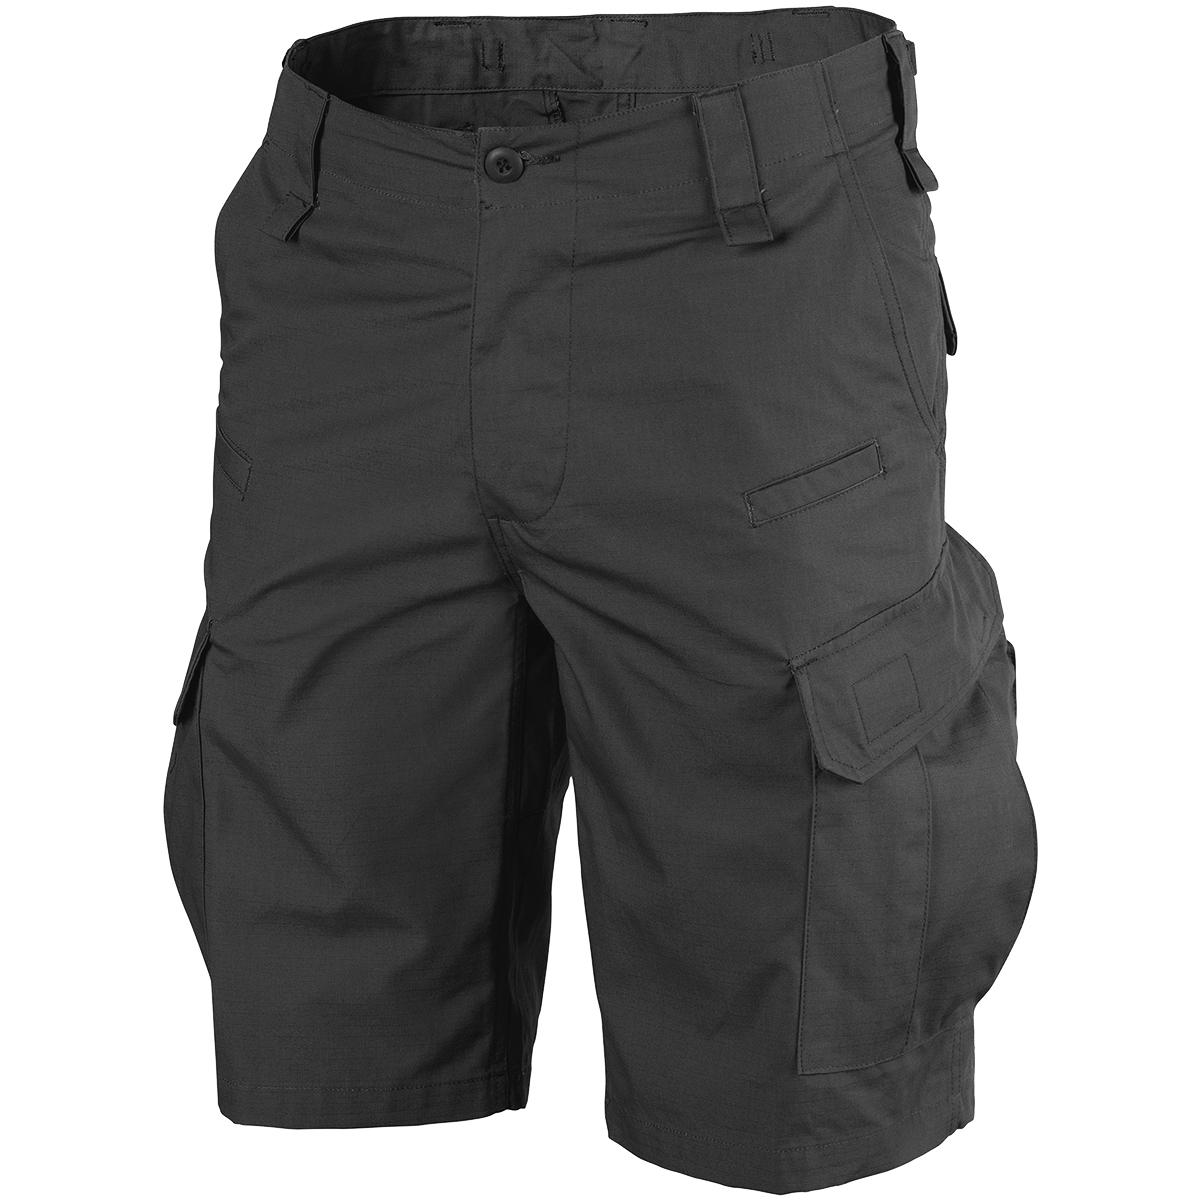 Black Uniform Shorts 14